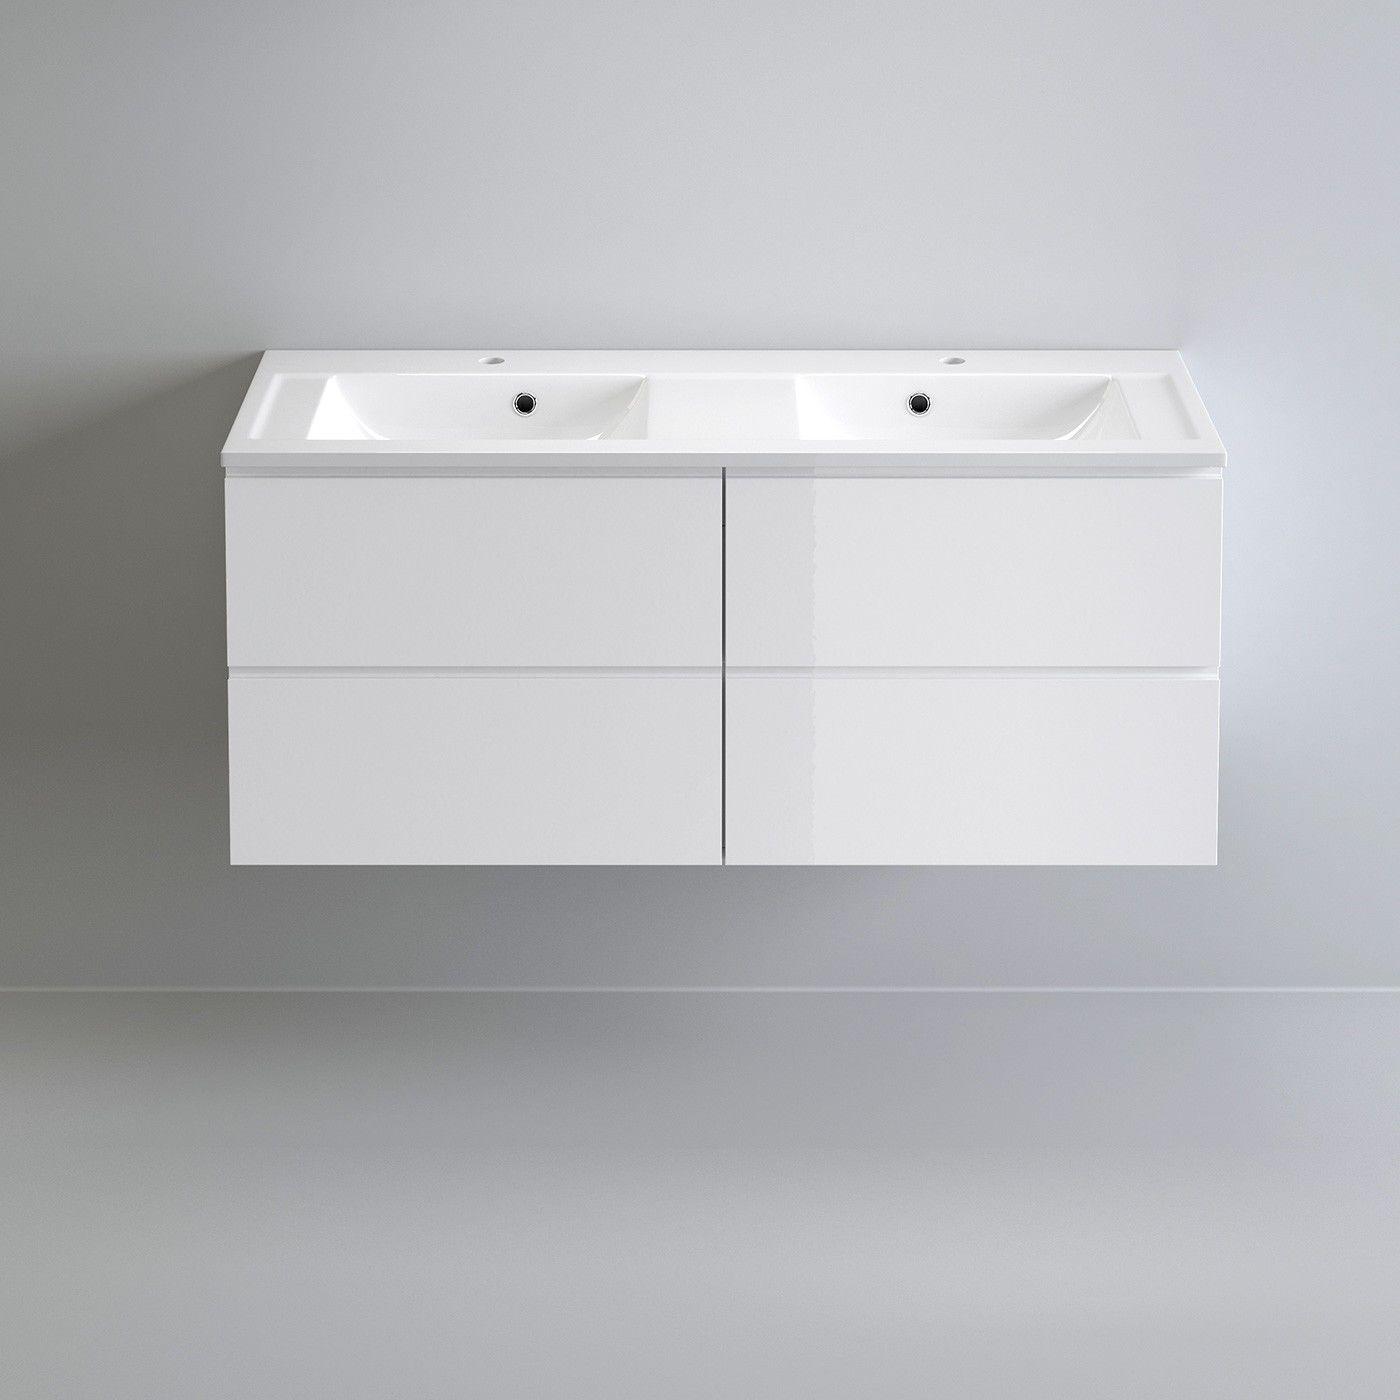 White Double Basin Bathroom Vanity Unit Sink Storage Modern ...